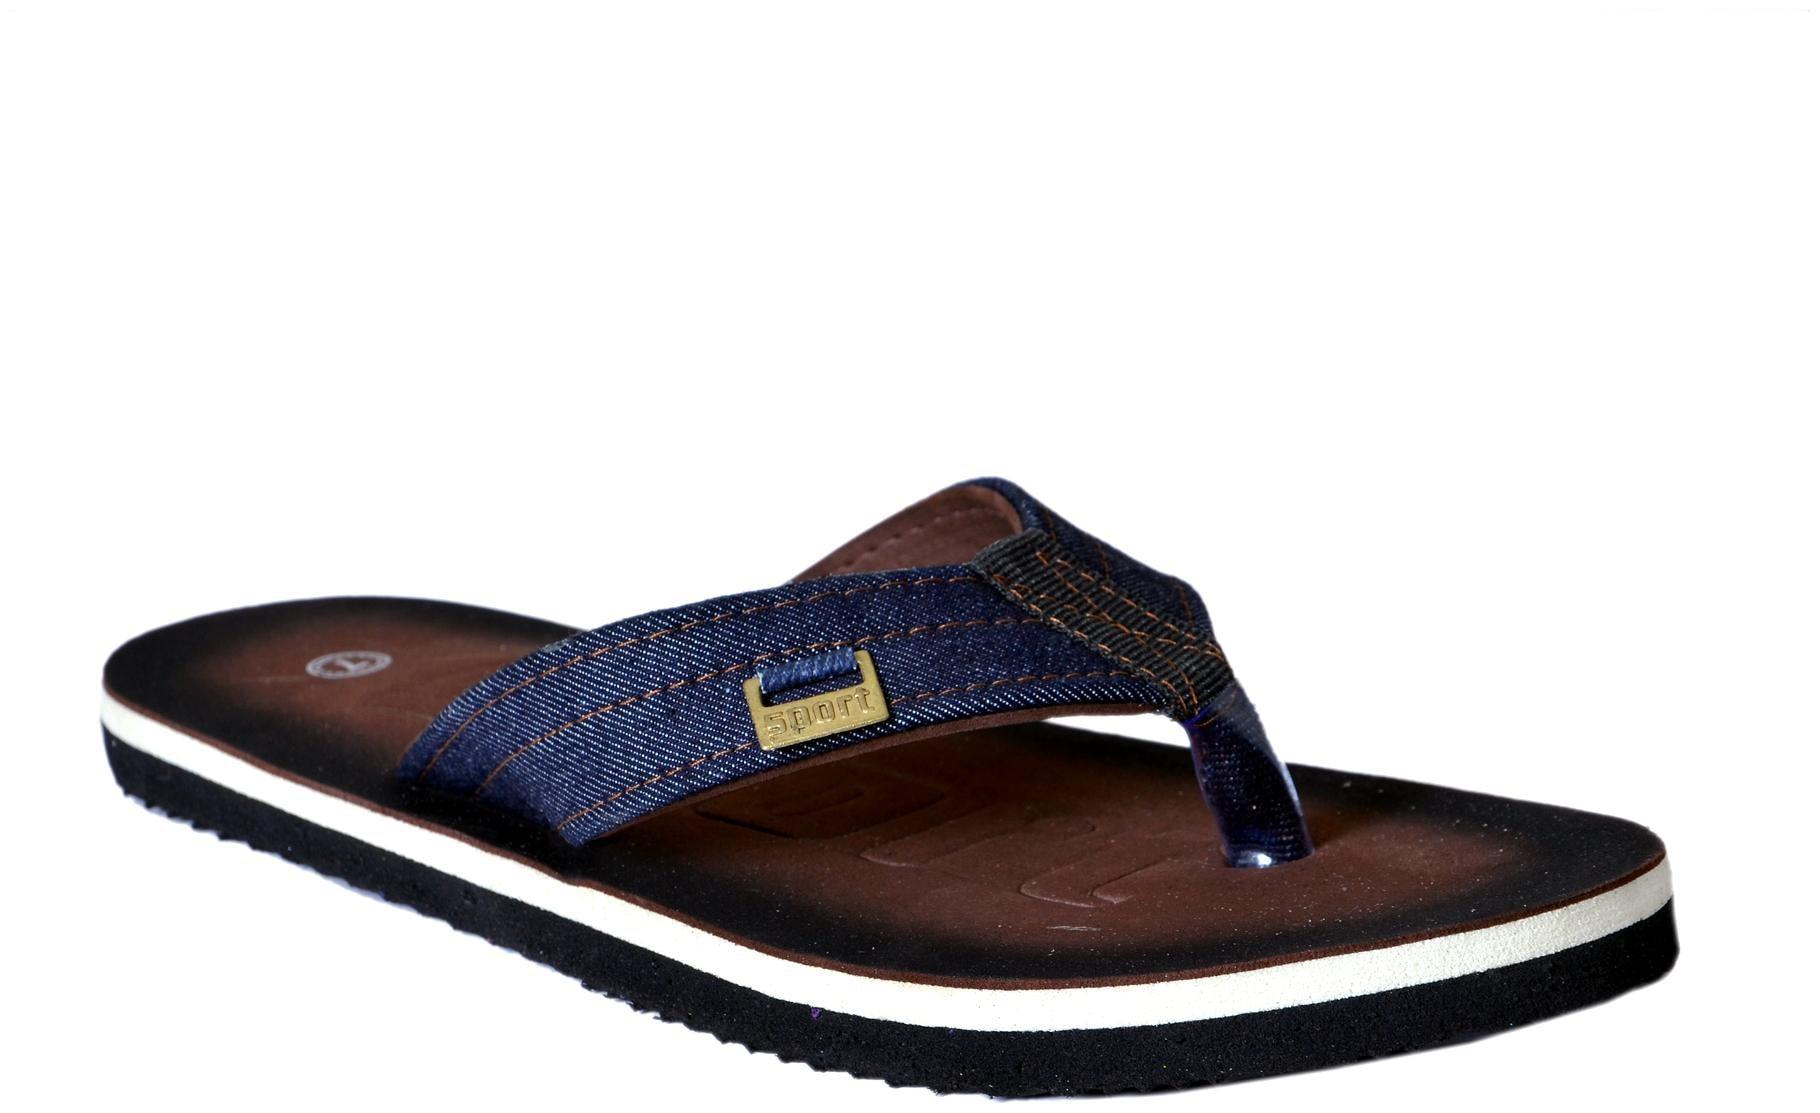 sports shoes 5e4a7 02fa4 Mens Flip Flops & Slippers - Buy Slippers & Flip Flops ...